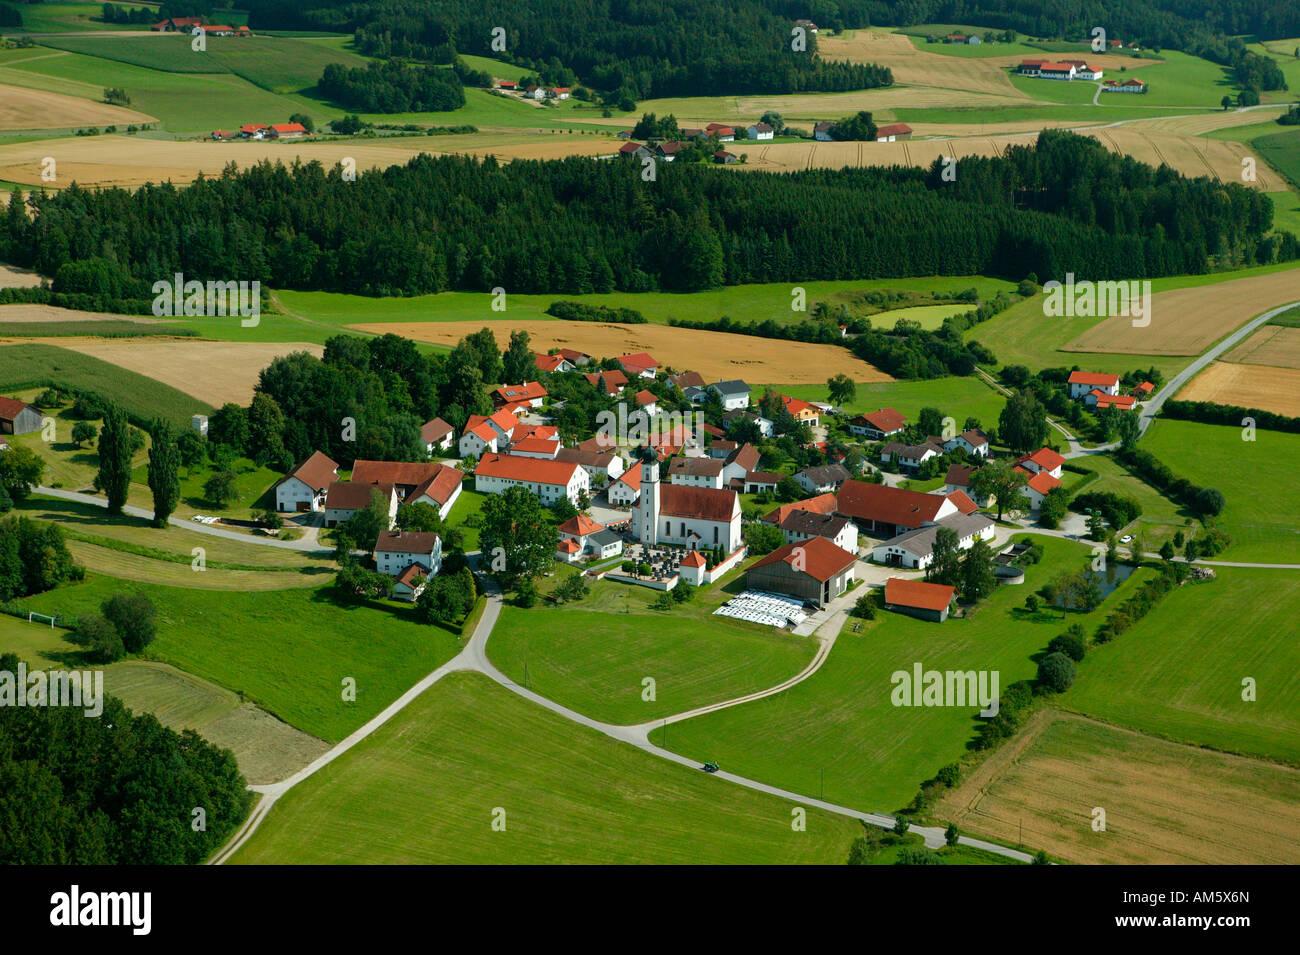 Spoiled hill landscape, Lower Bavaria, Bavaria, Germany - Stock Image